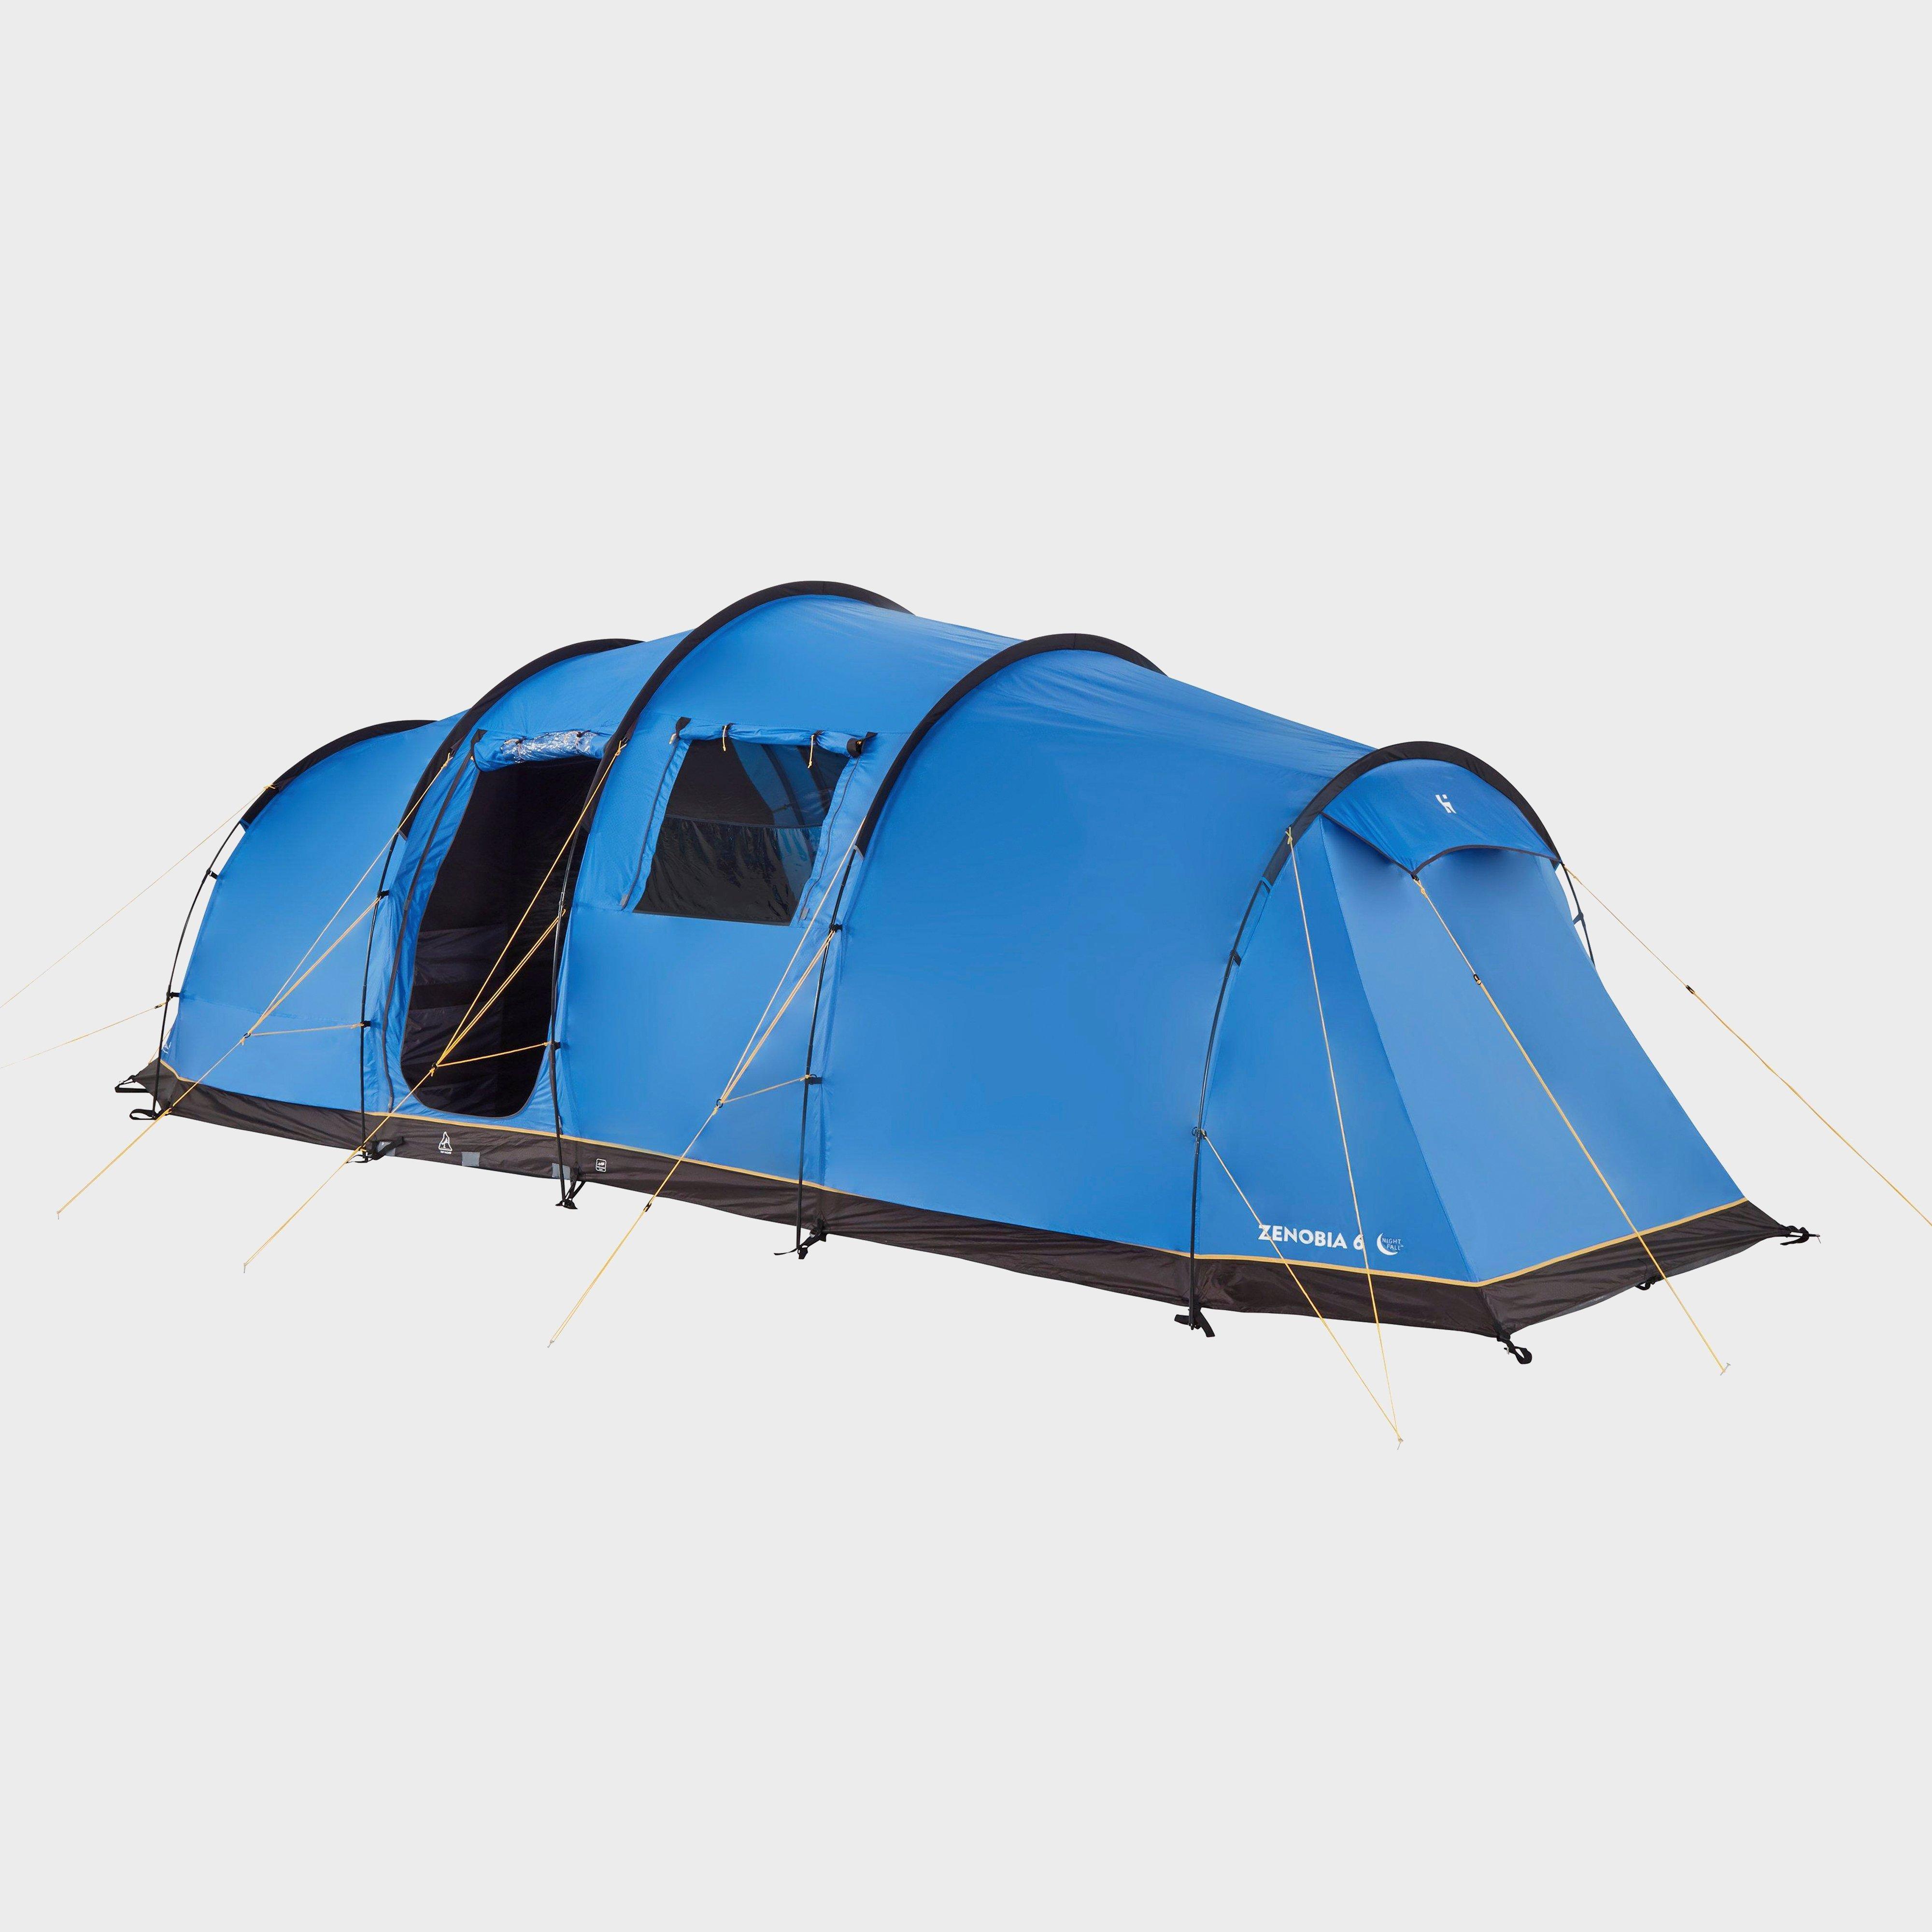 HI-GEAR Zenobia 6 Nightfall Tent, Blue/IGO